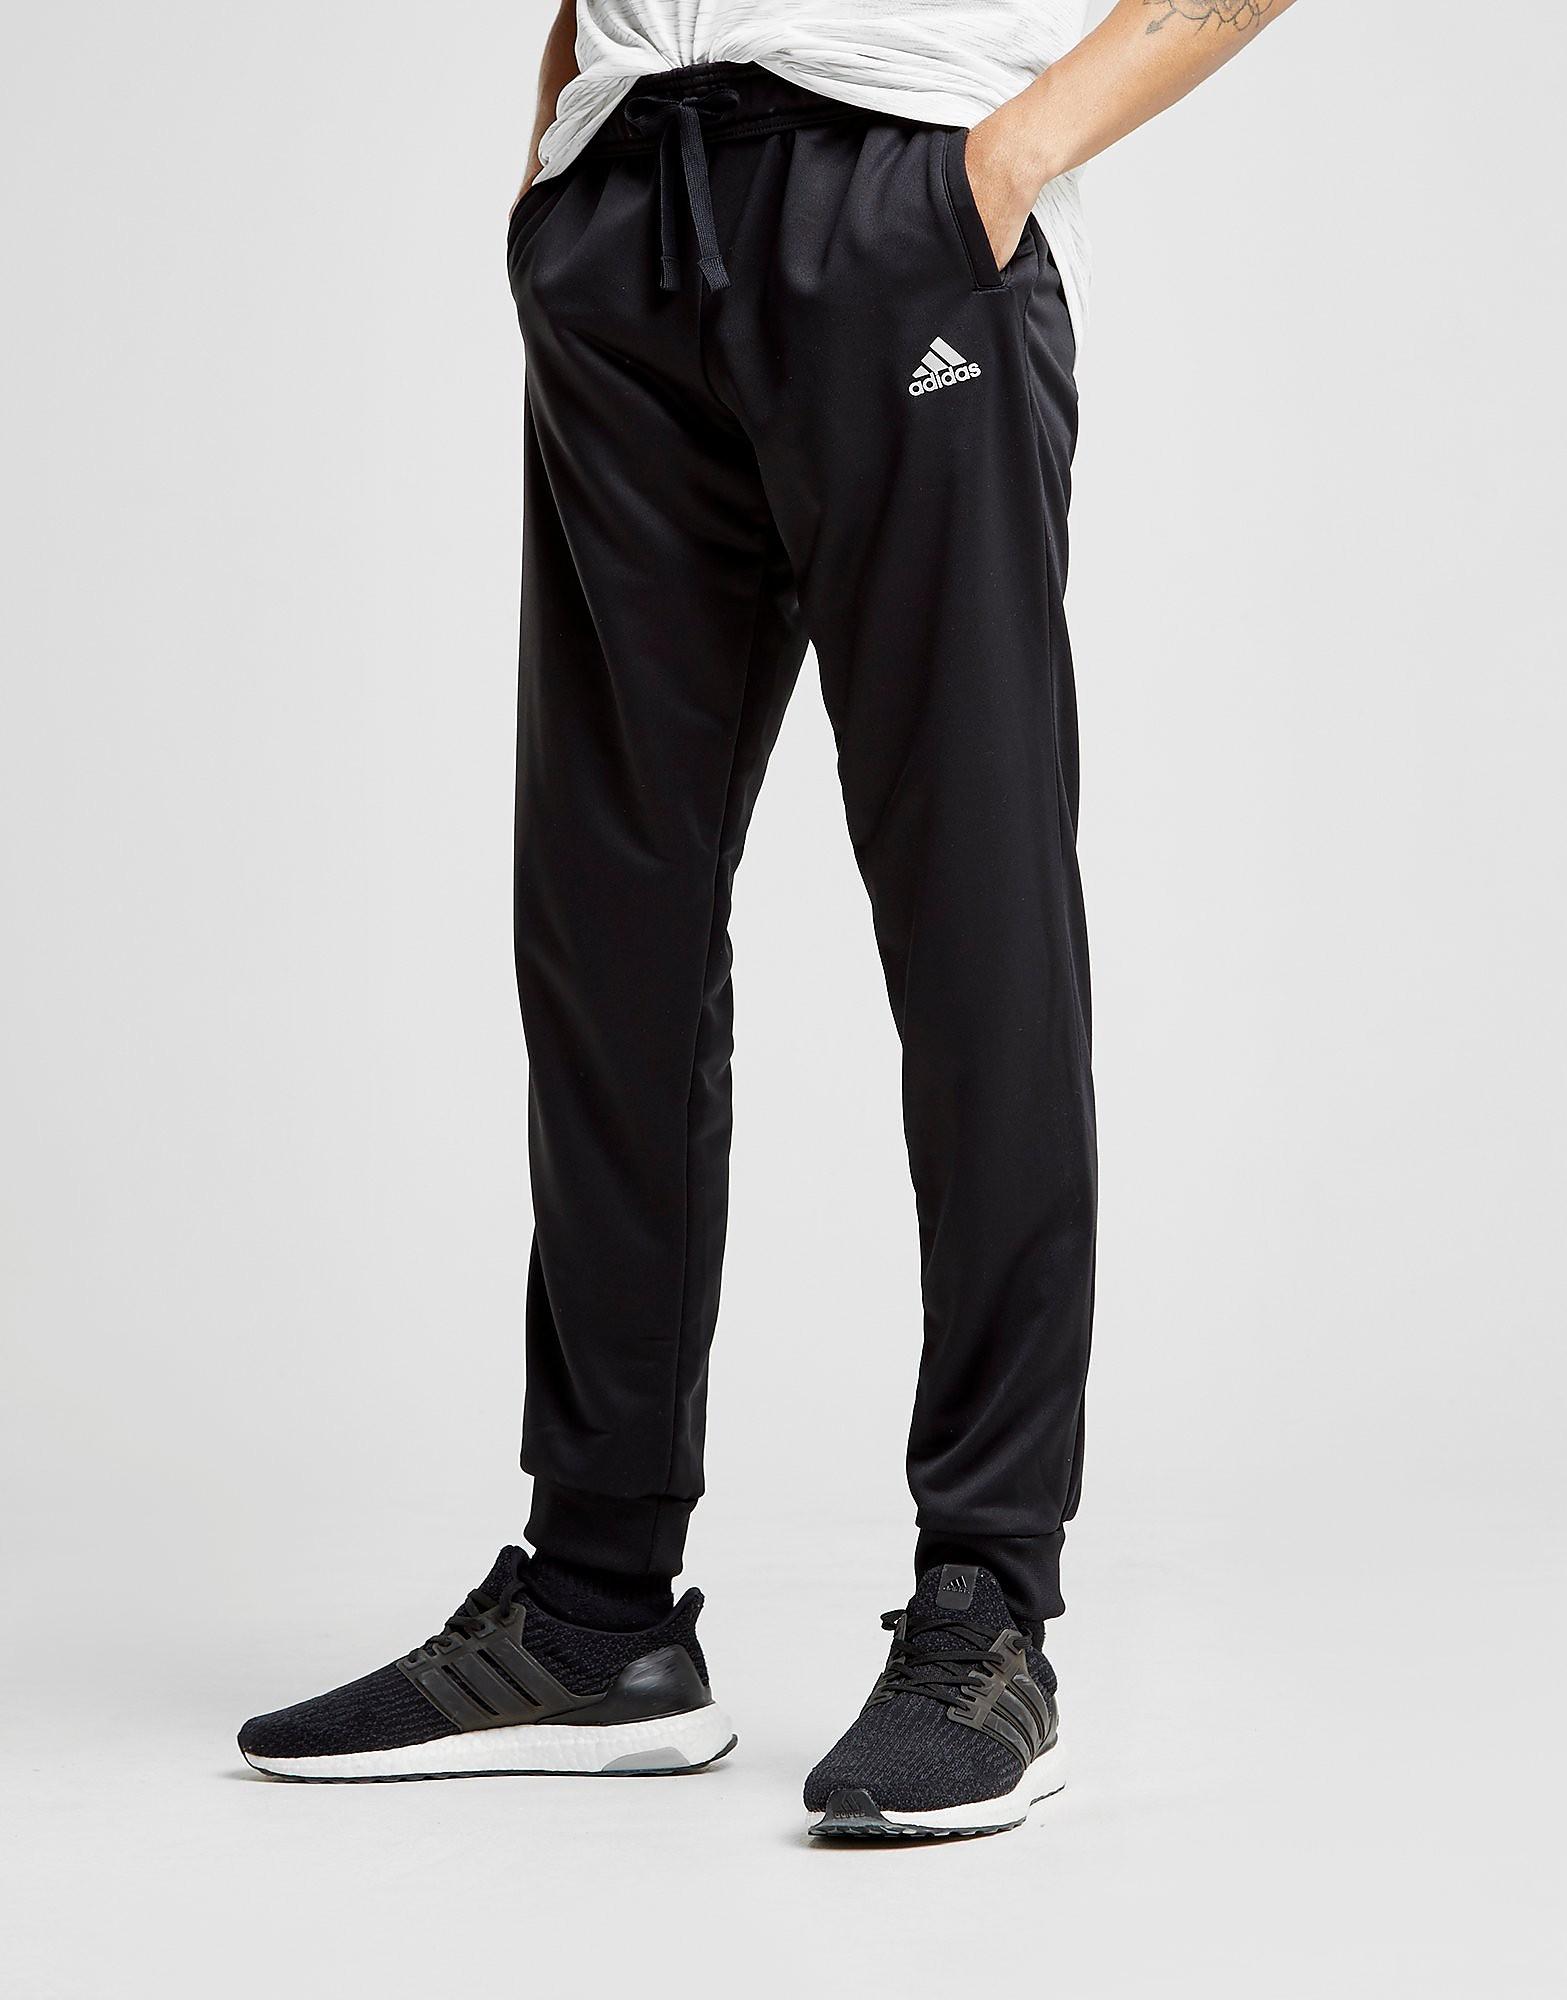 adidas Gametime Pants